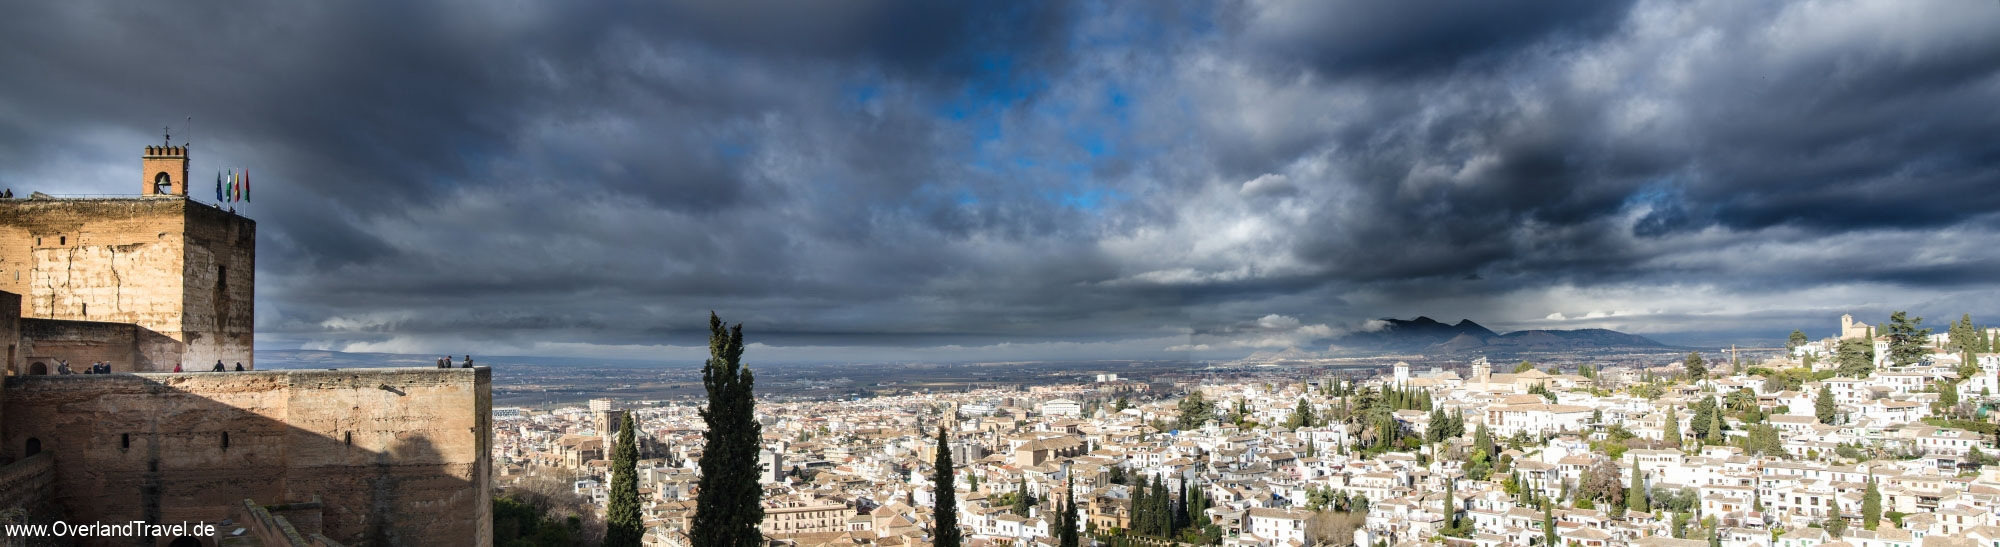 Alhambra Granada Thunderstorm Castle Panorama